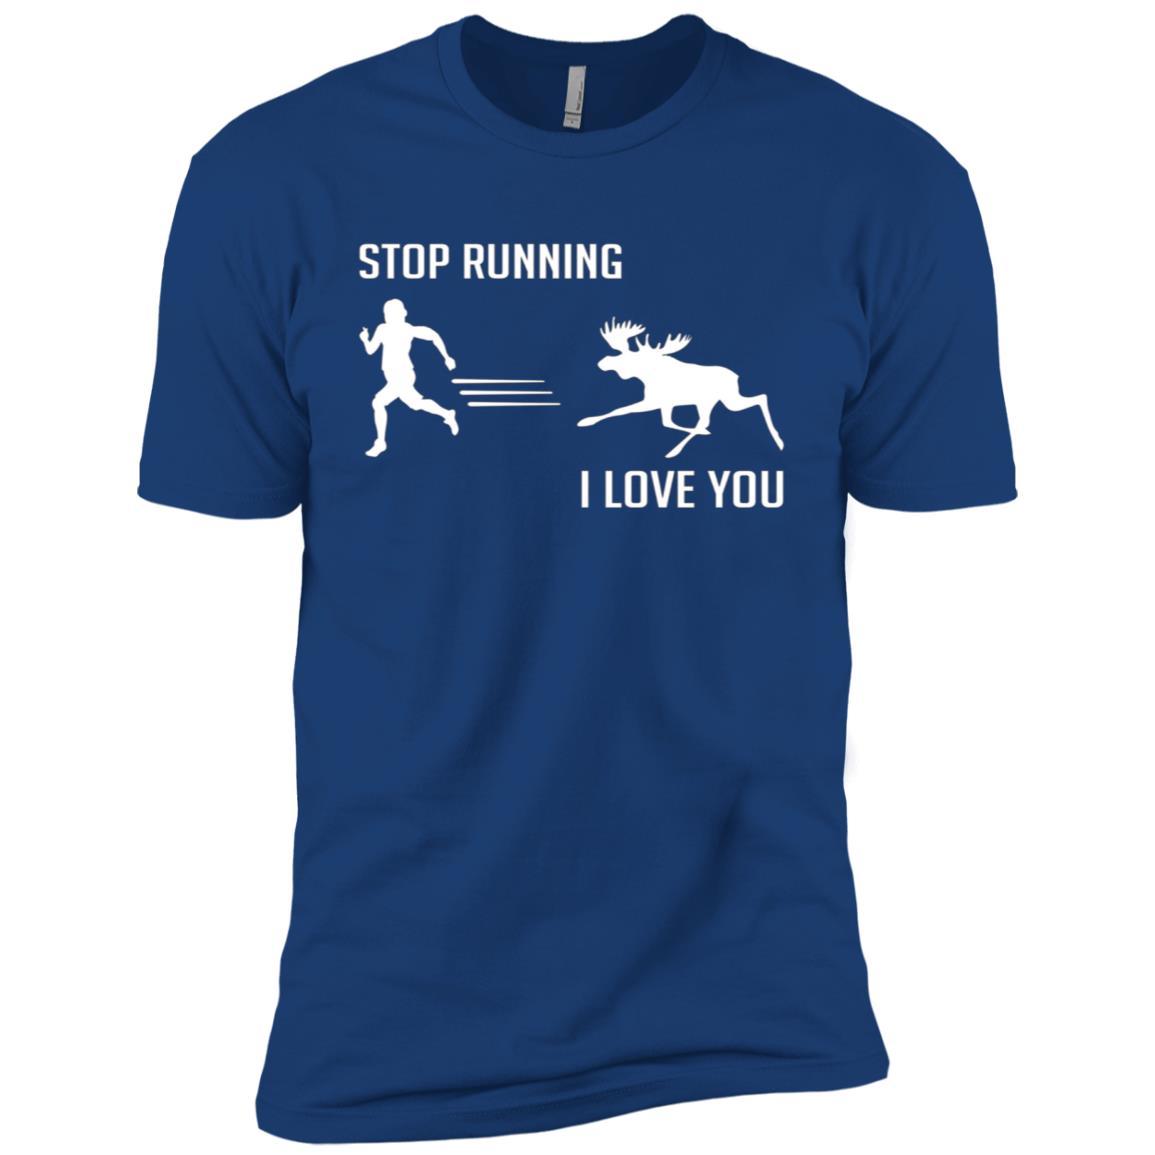 Stop Running – Moose Chasing, Funny Cute Moose Men Short Sleeve T-Shirt